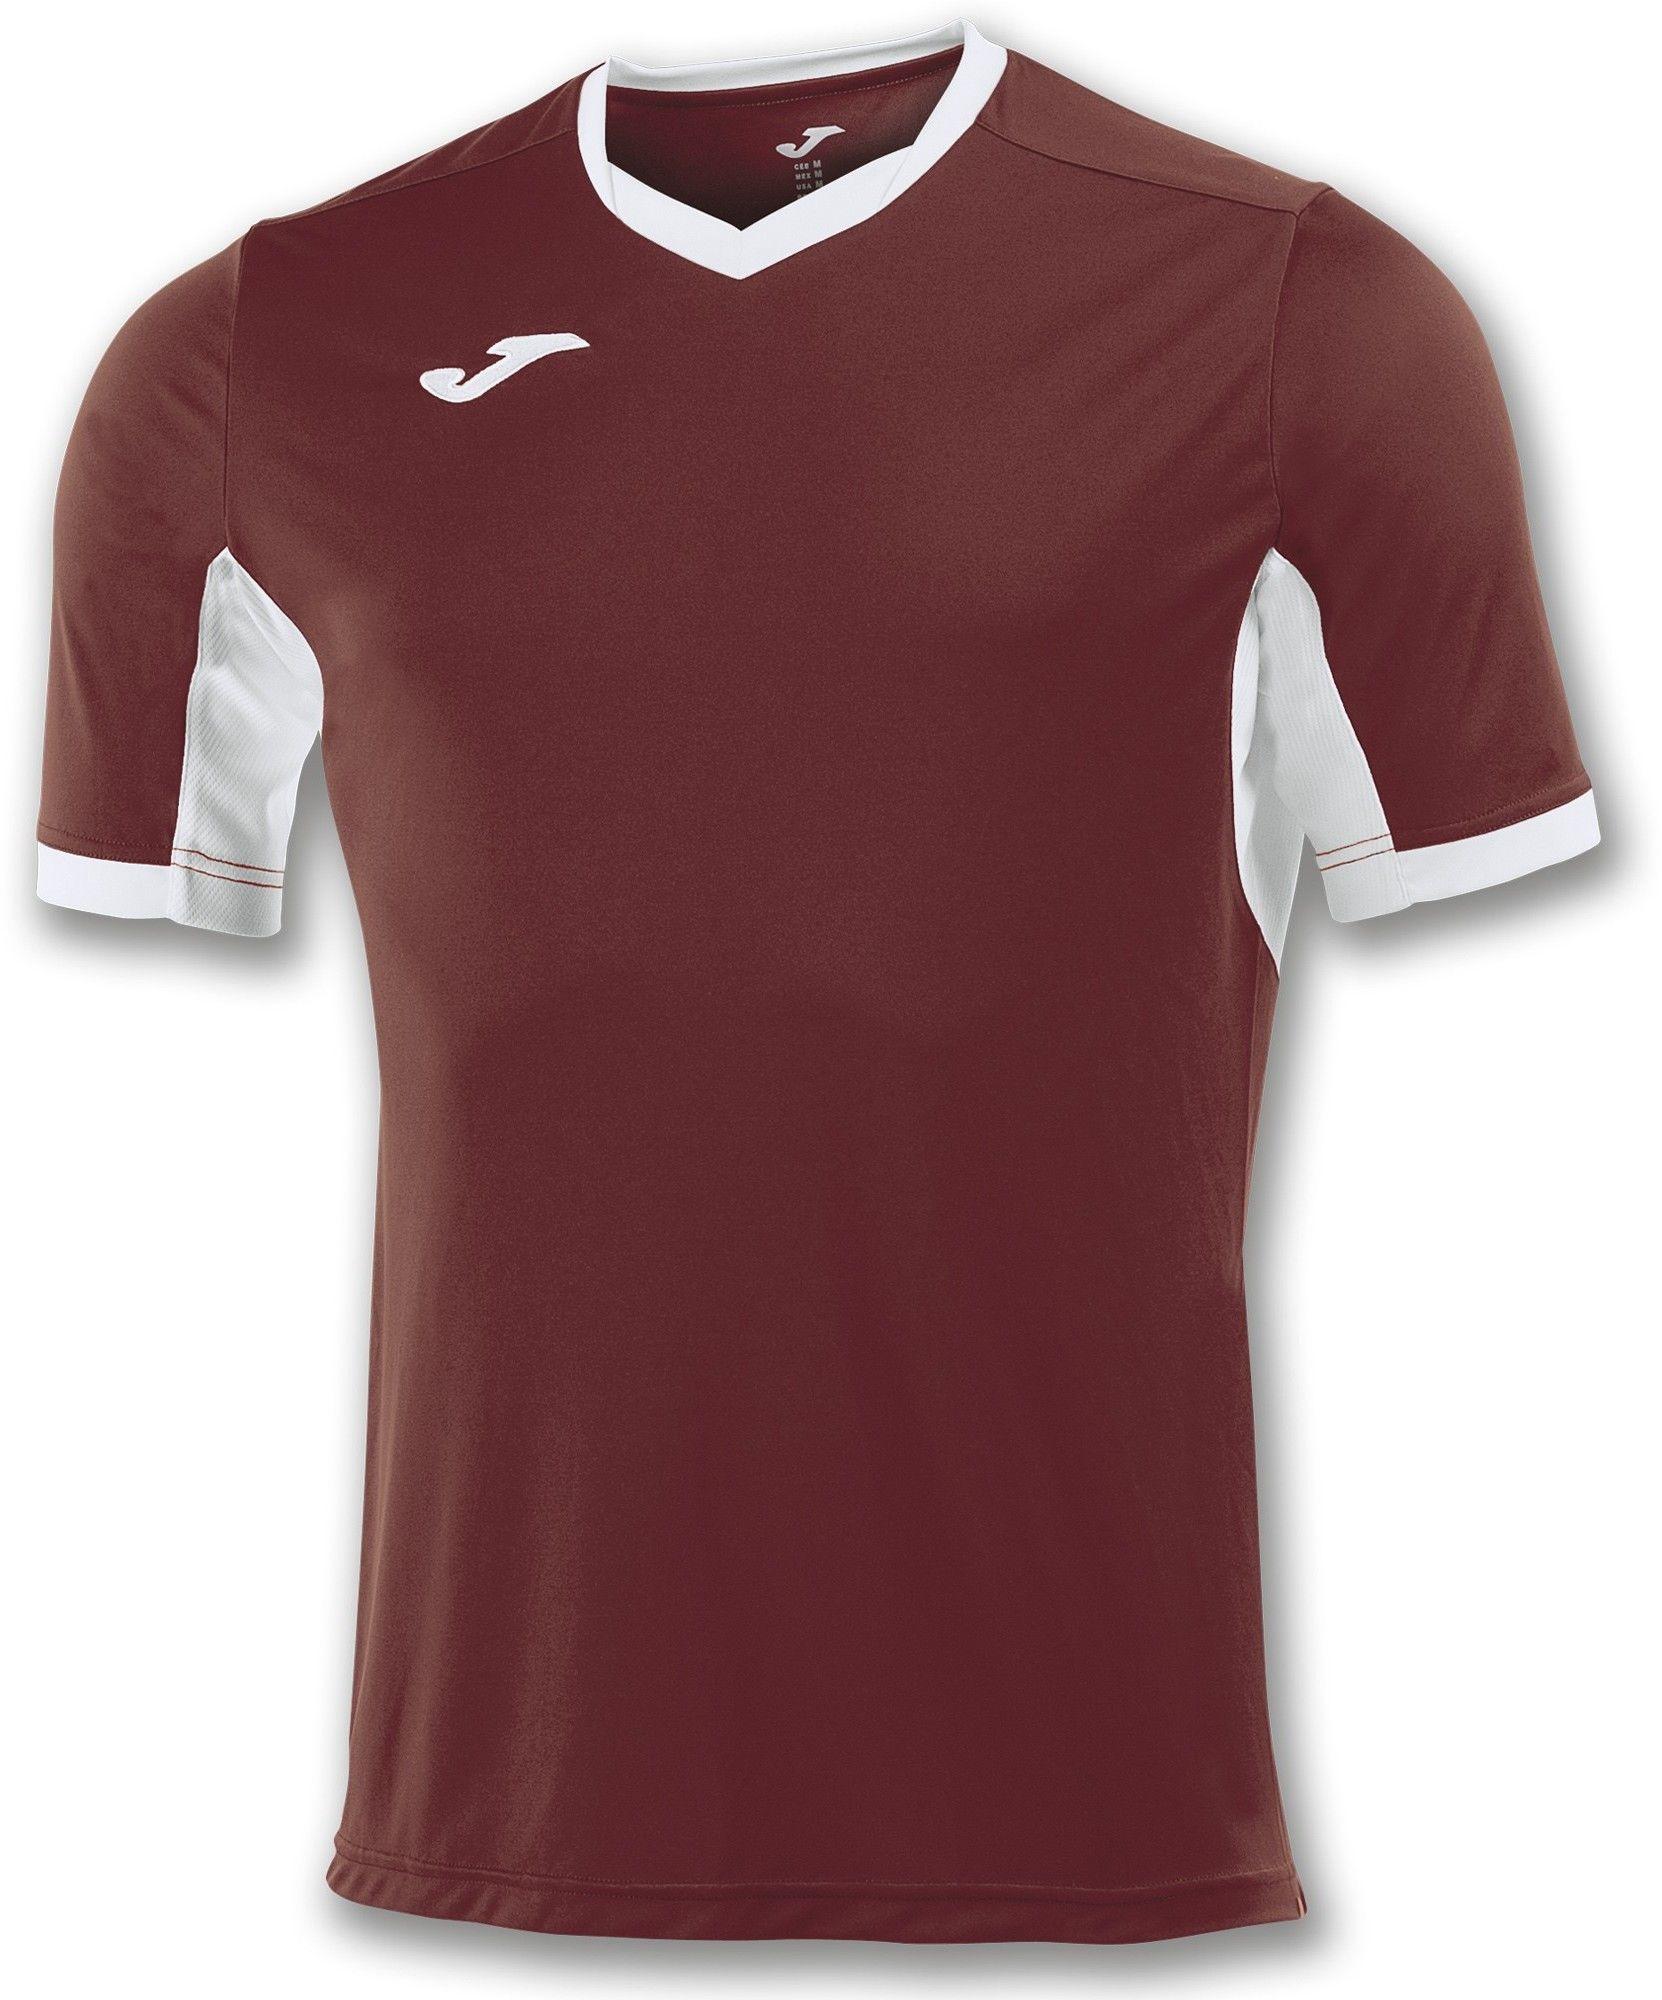 Koszulka Joma Champion IV burgundy/white (10 szt.)